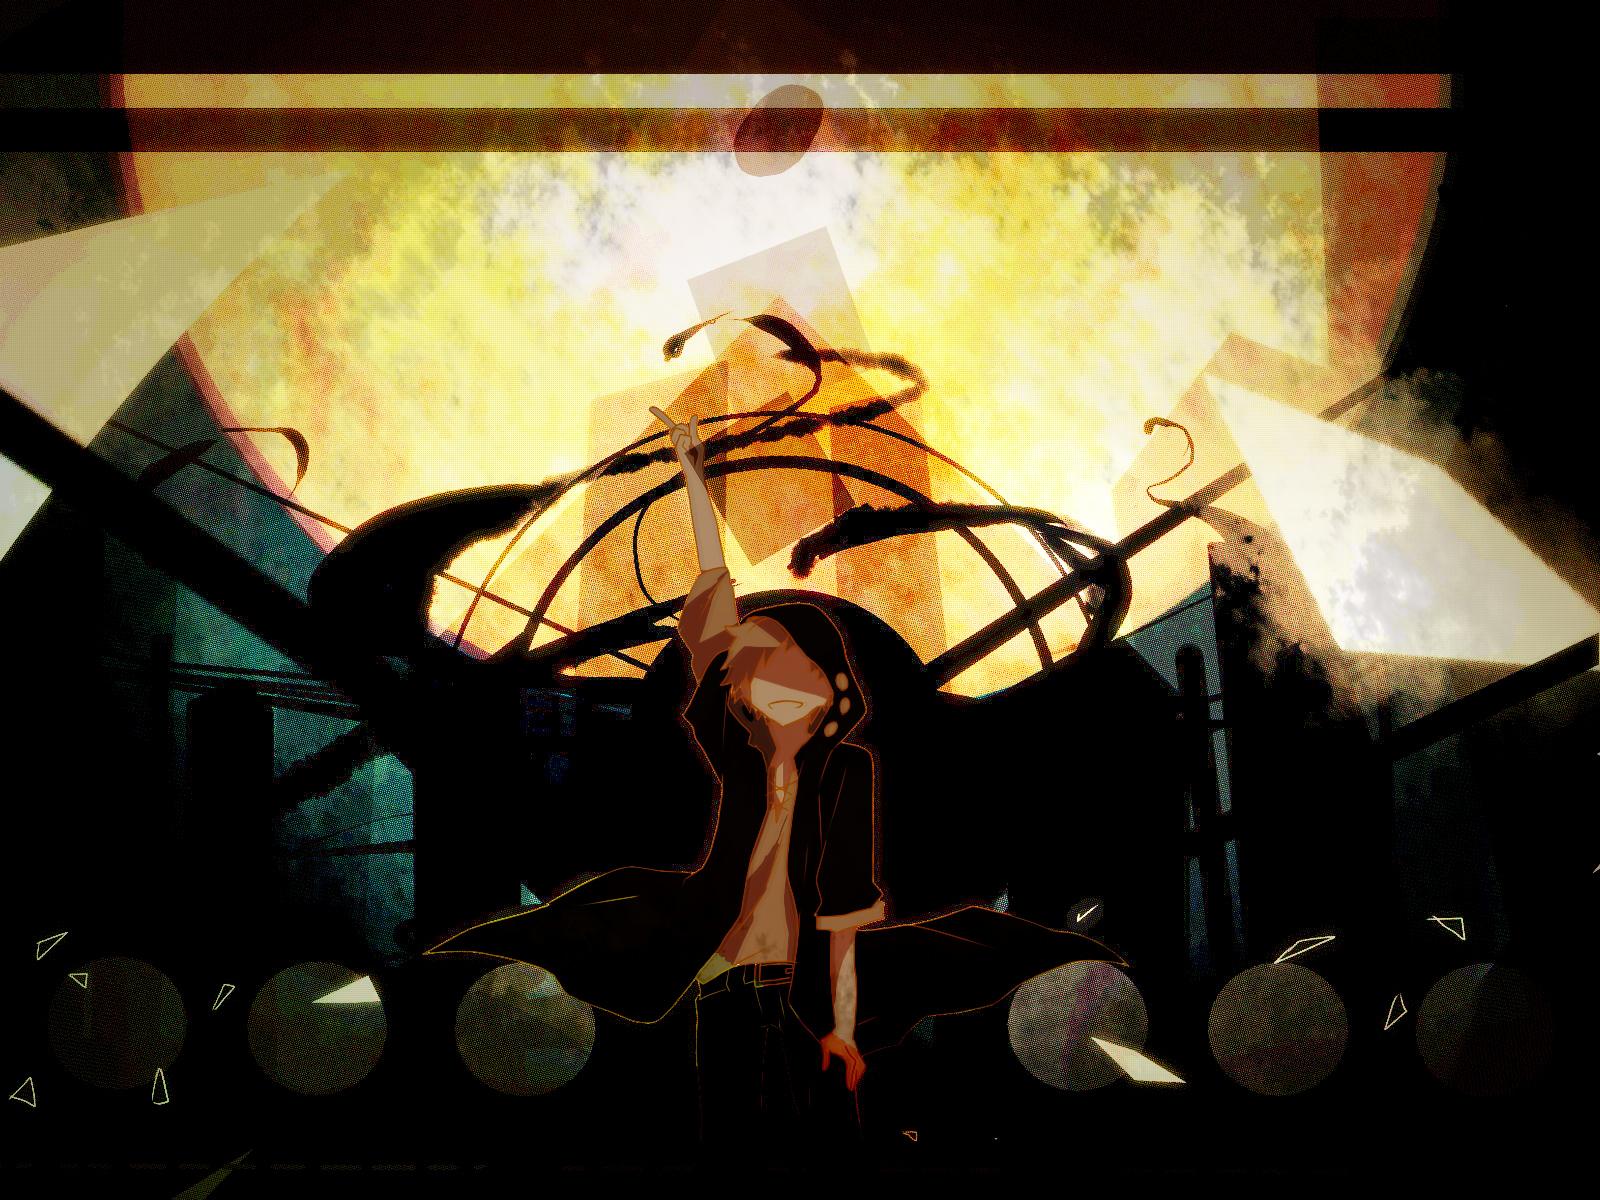 Shuuya Kano Wallpaper View Fullsize Kano Shuuya